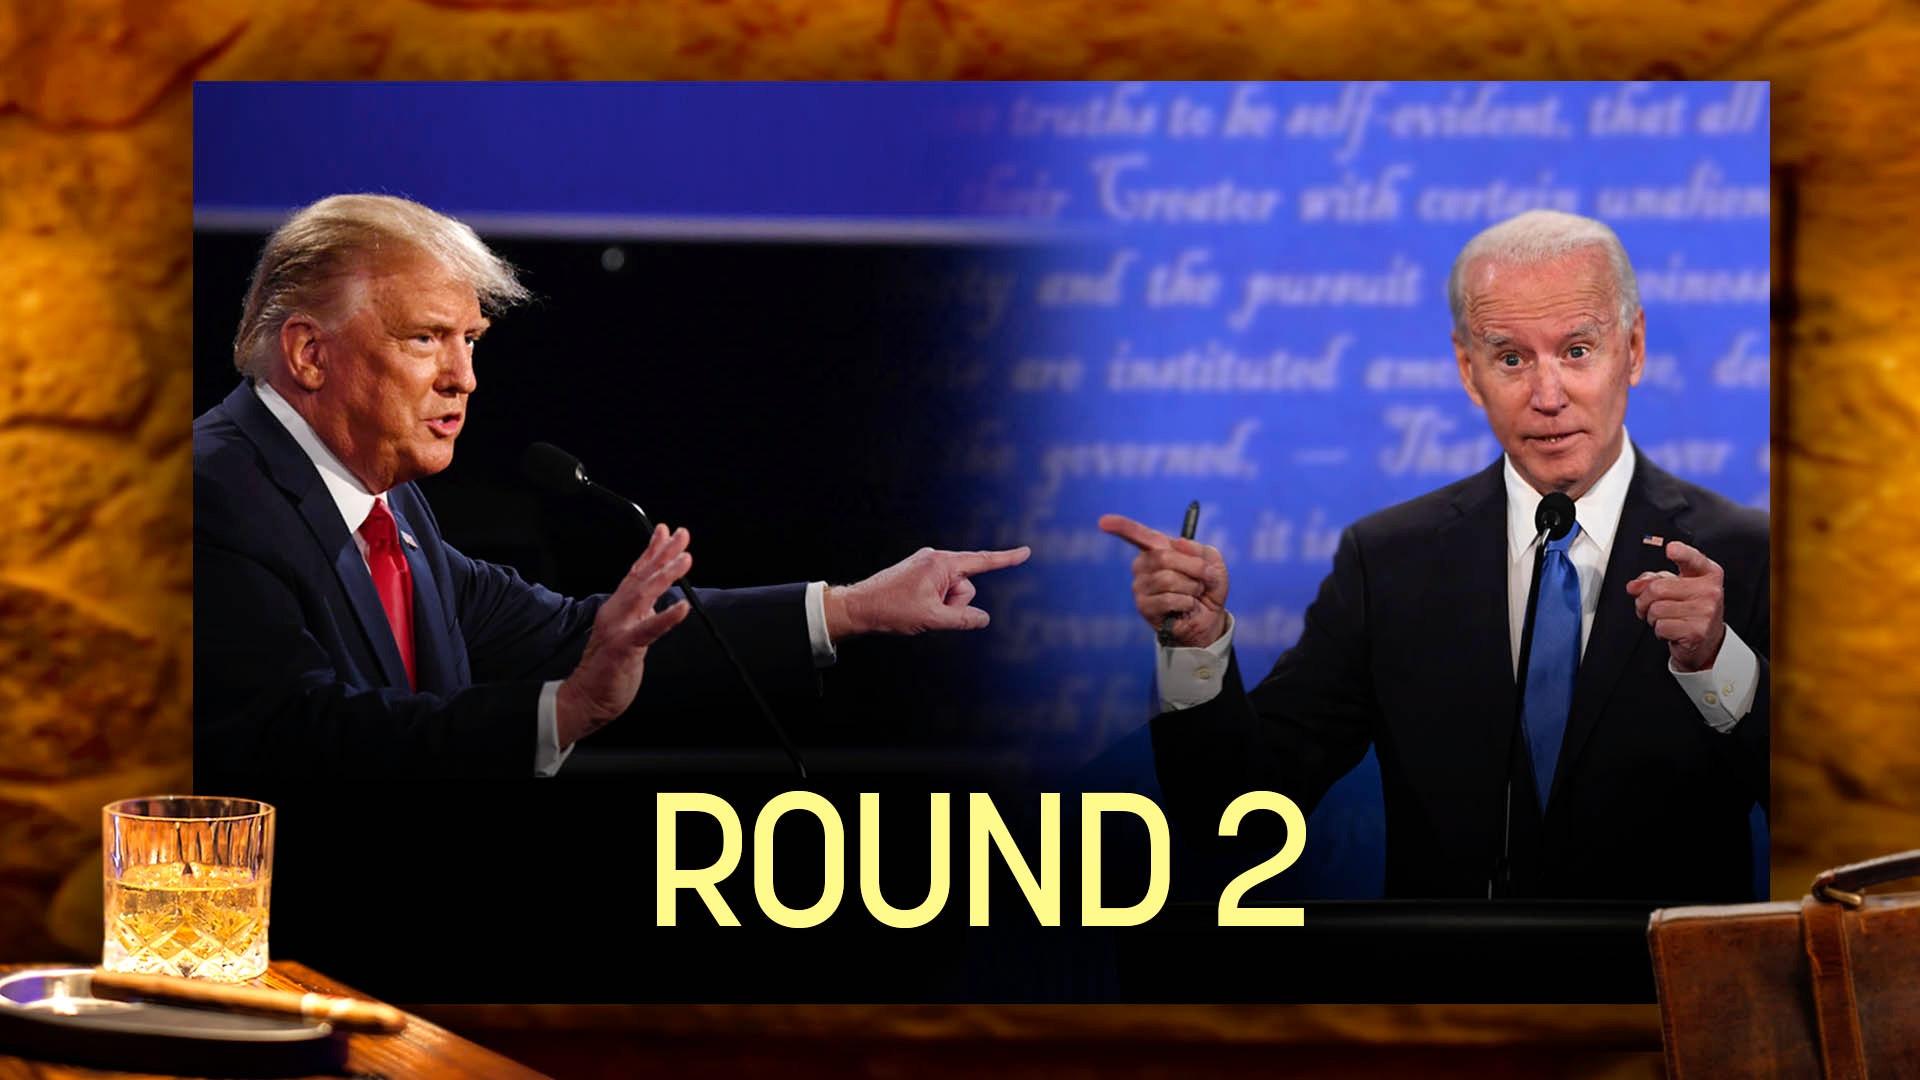 Mute This Debate Edition